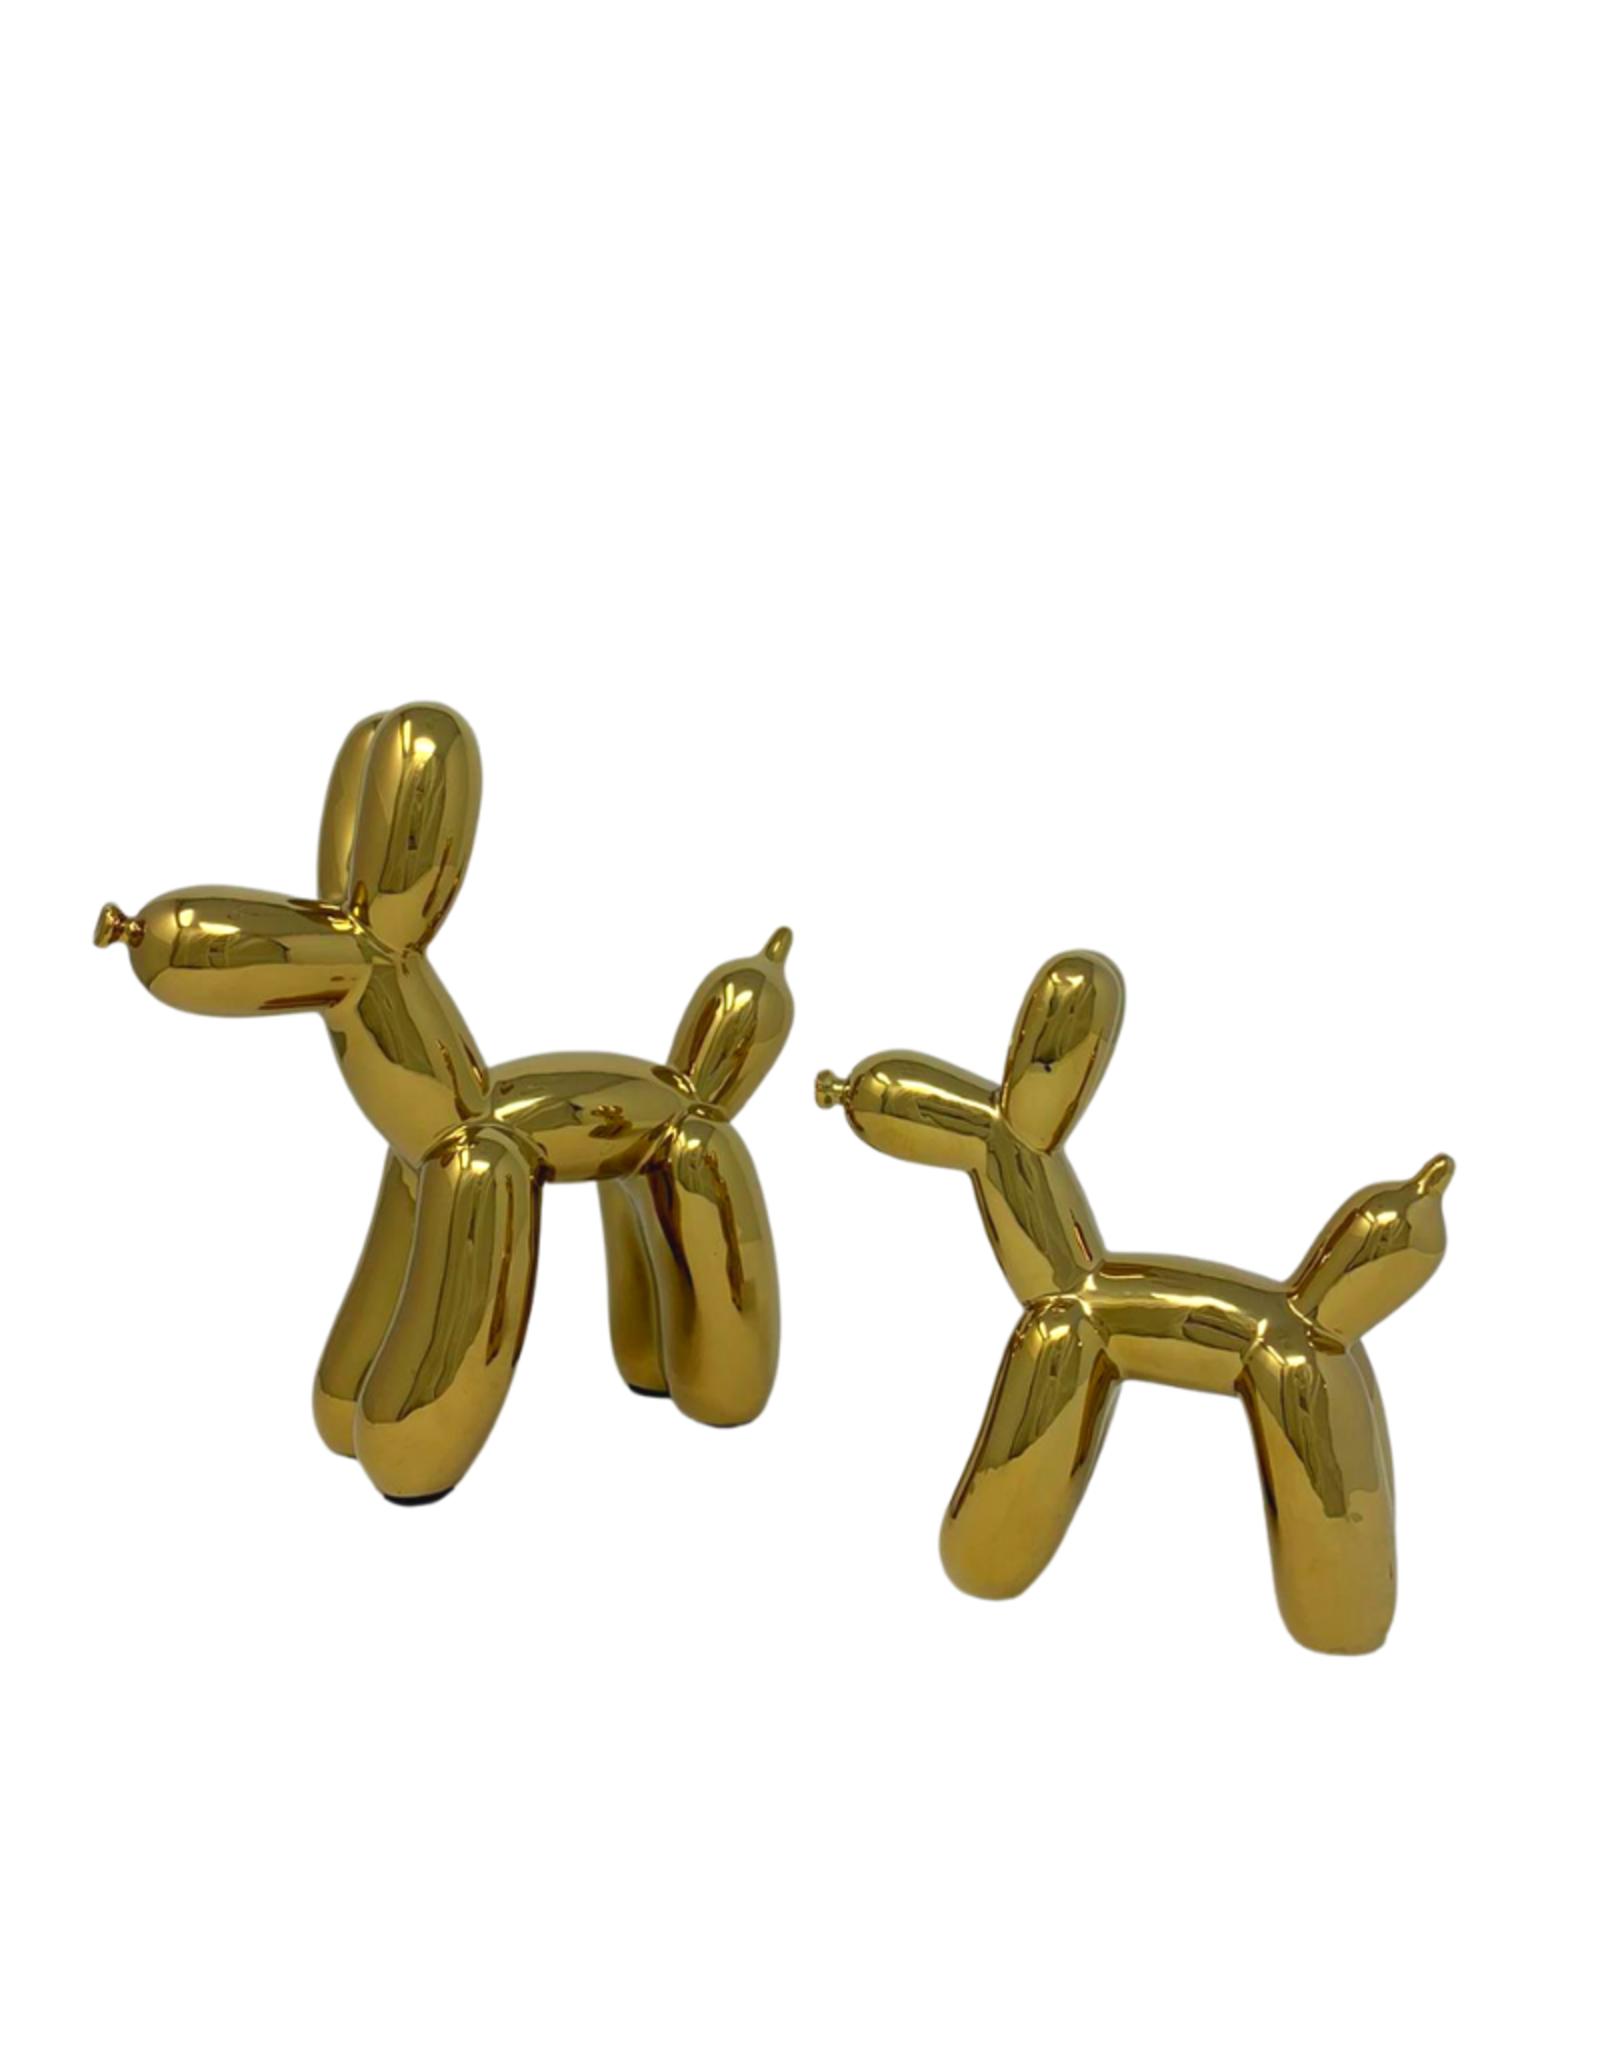 Large Ceramic Balloon Dog - Gold